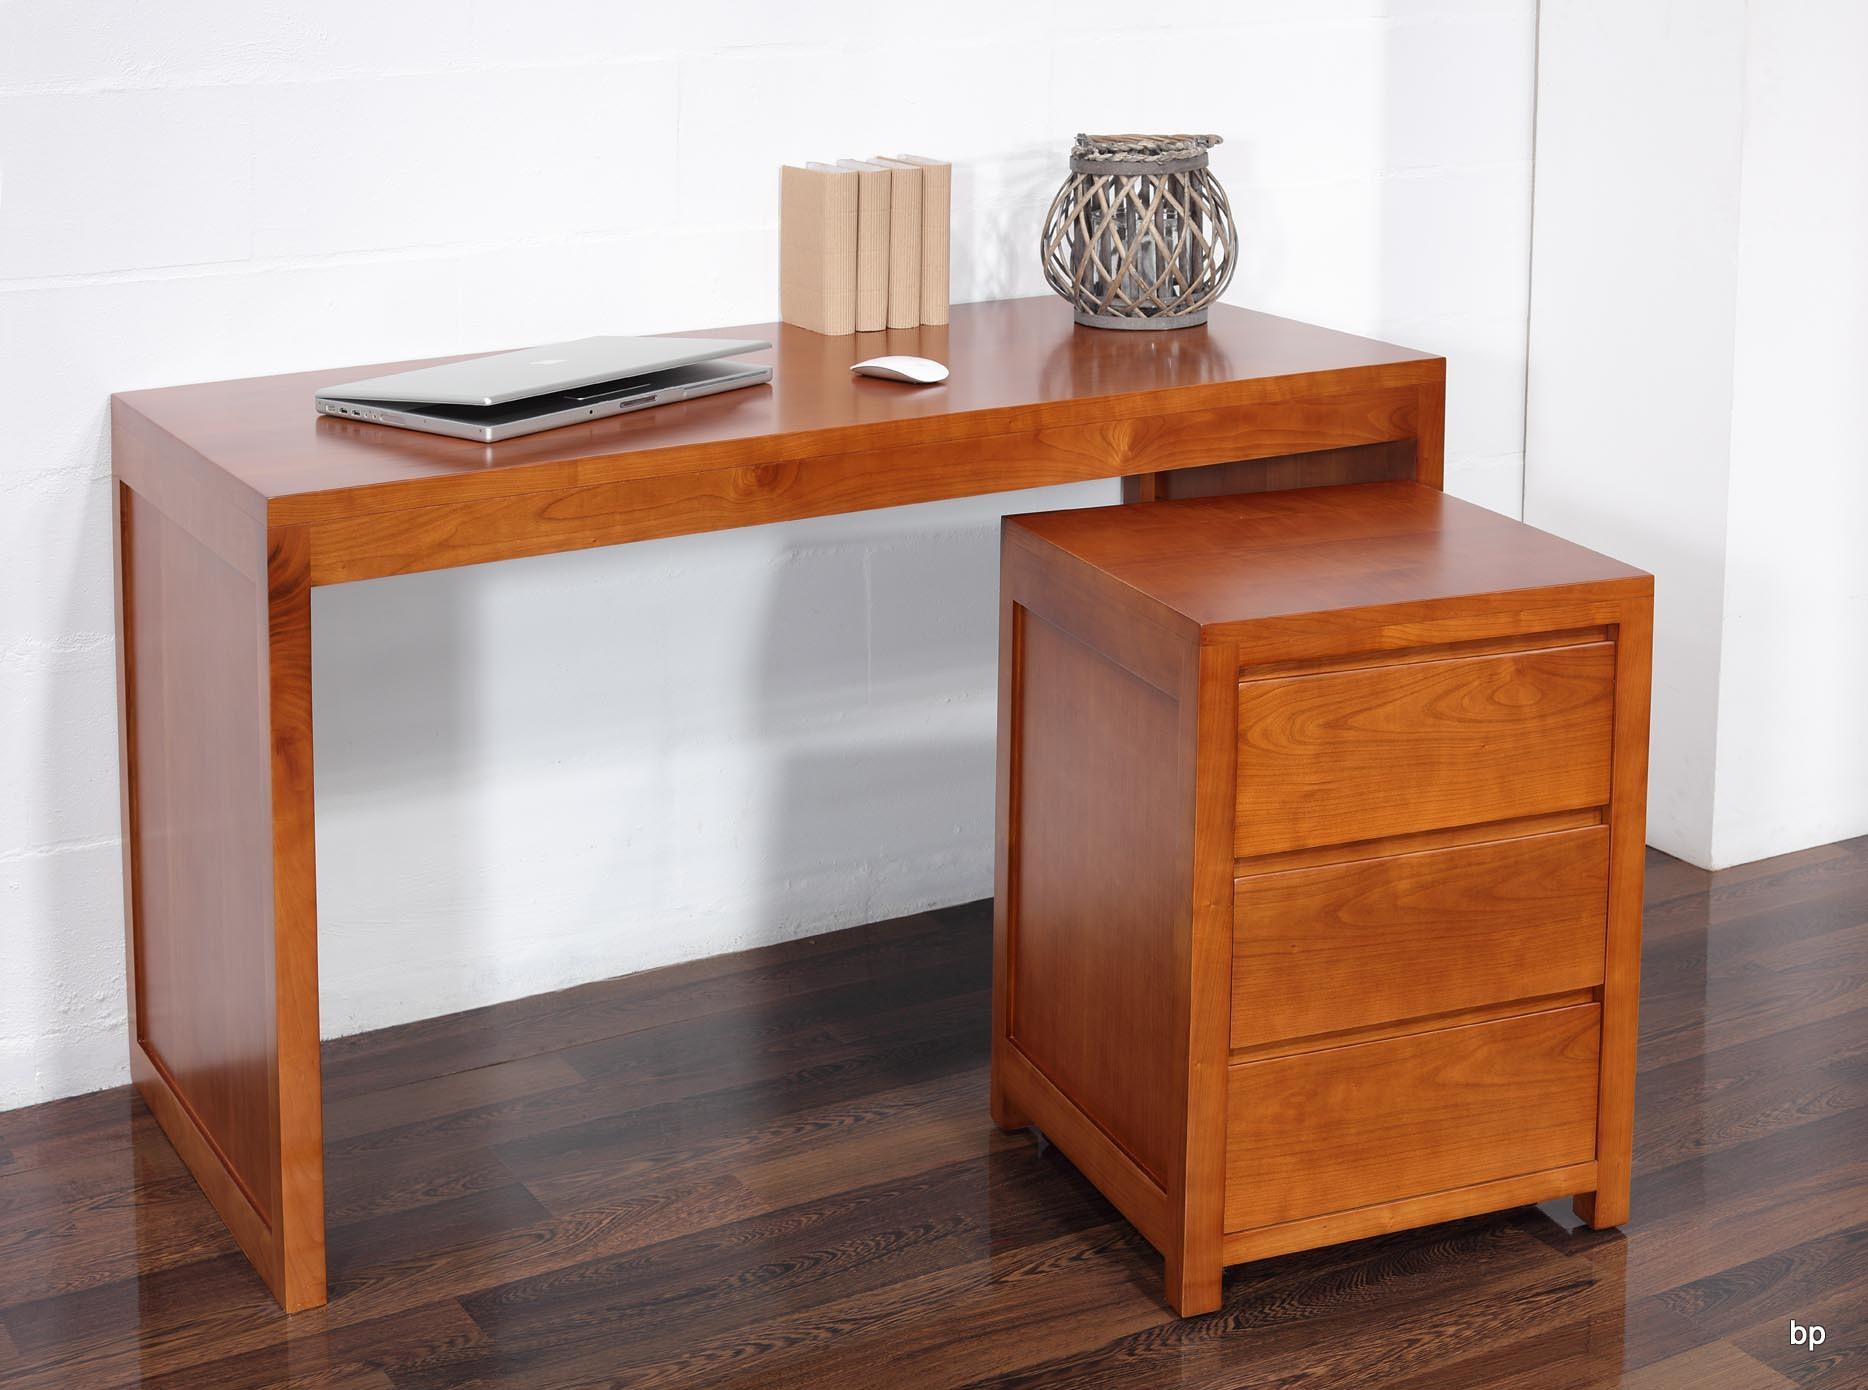 Mesa escritorio estilo contempor neo en madera cerezo - Mesa escritorio con cajones ...